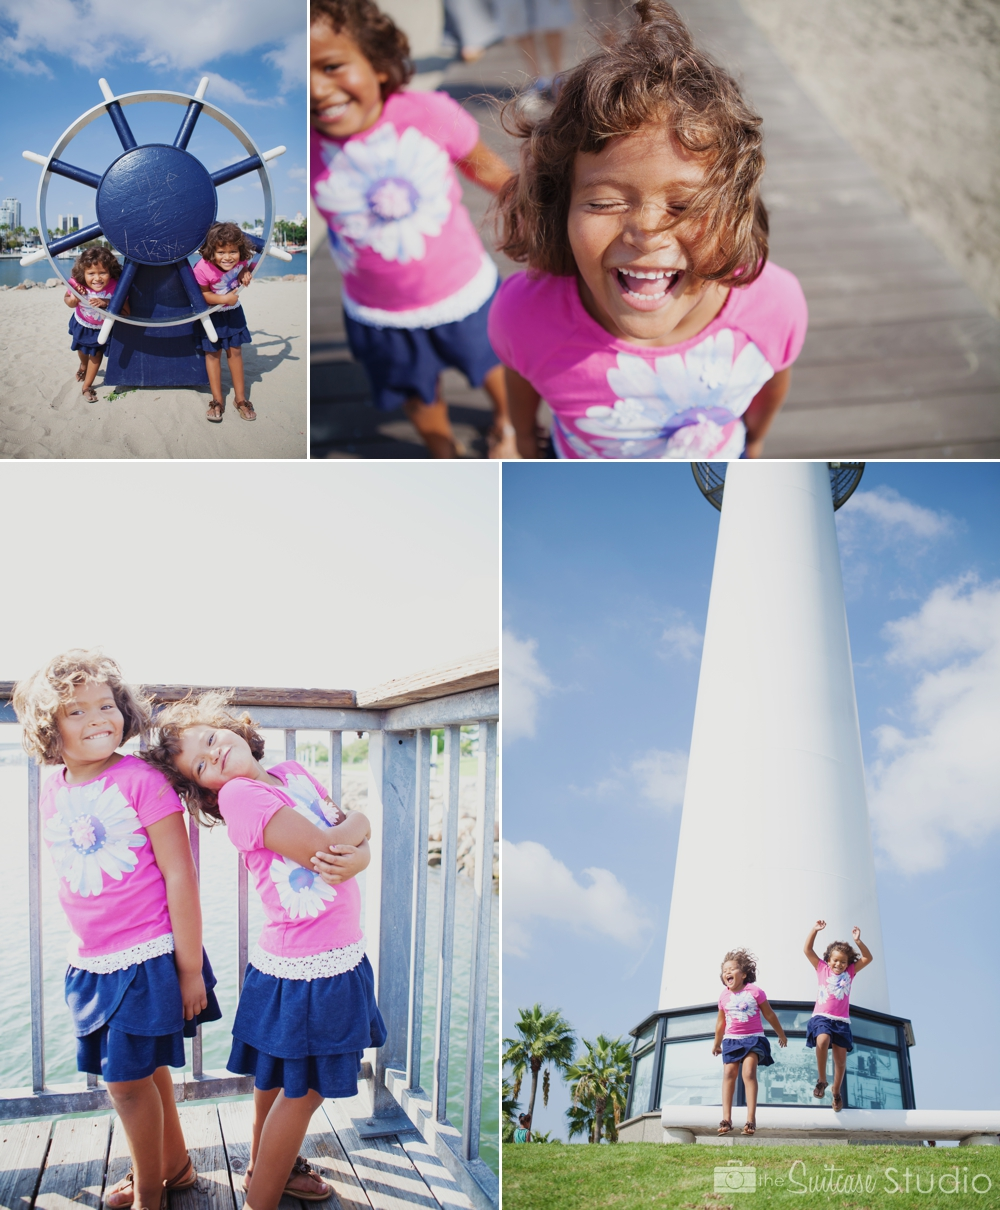 jon-william-twins social media collages 2.jpg